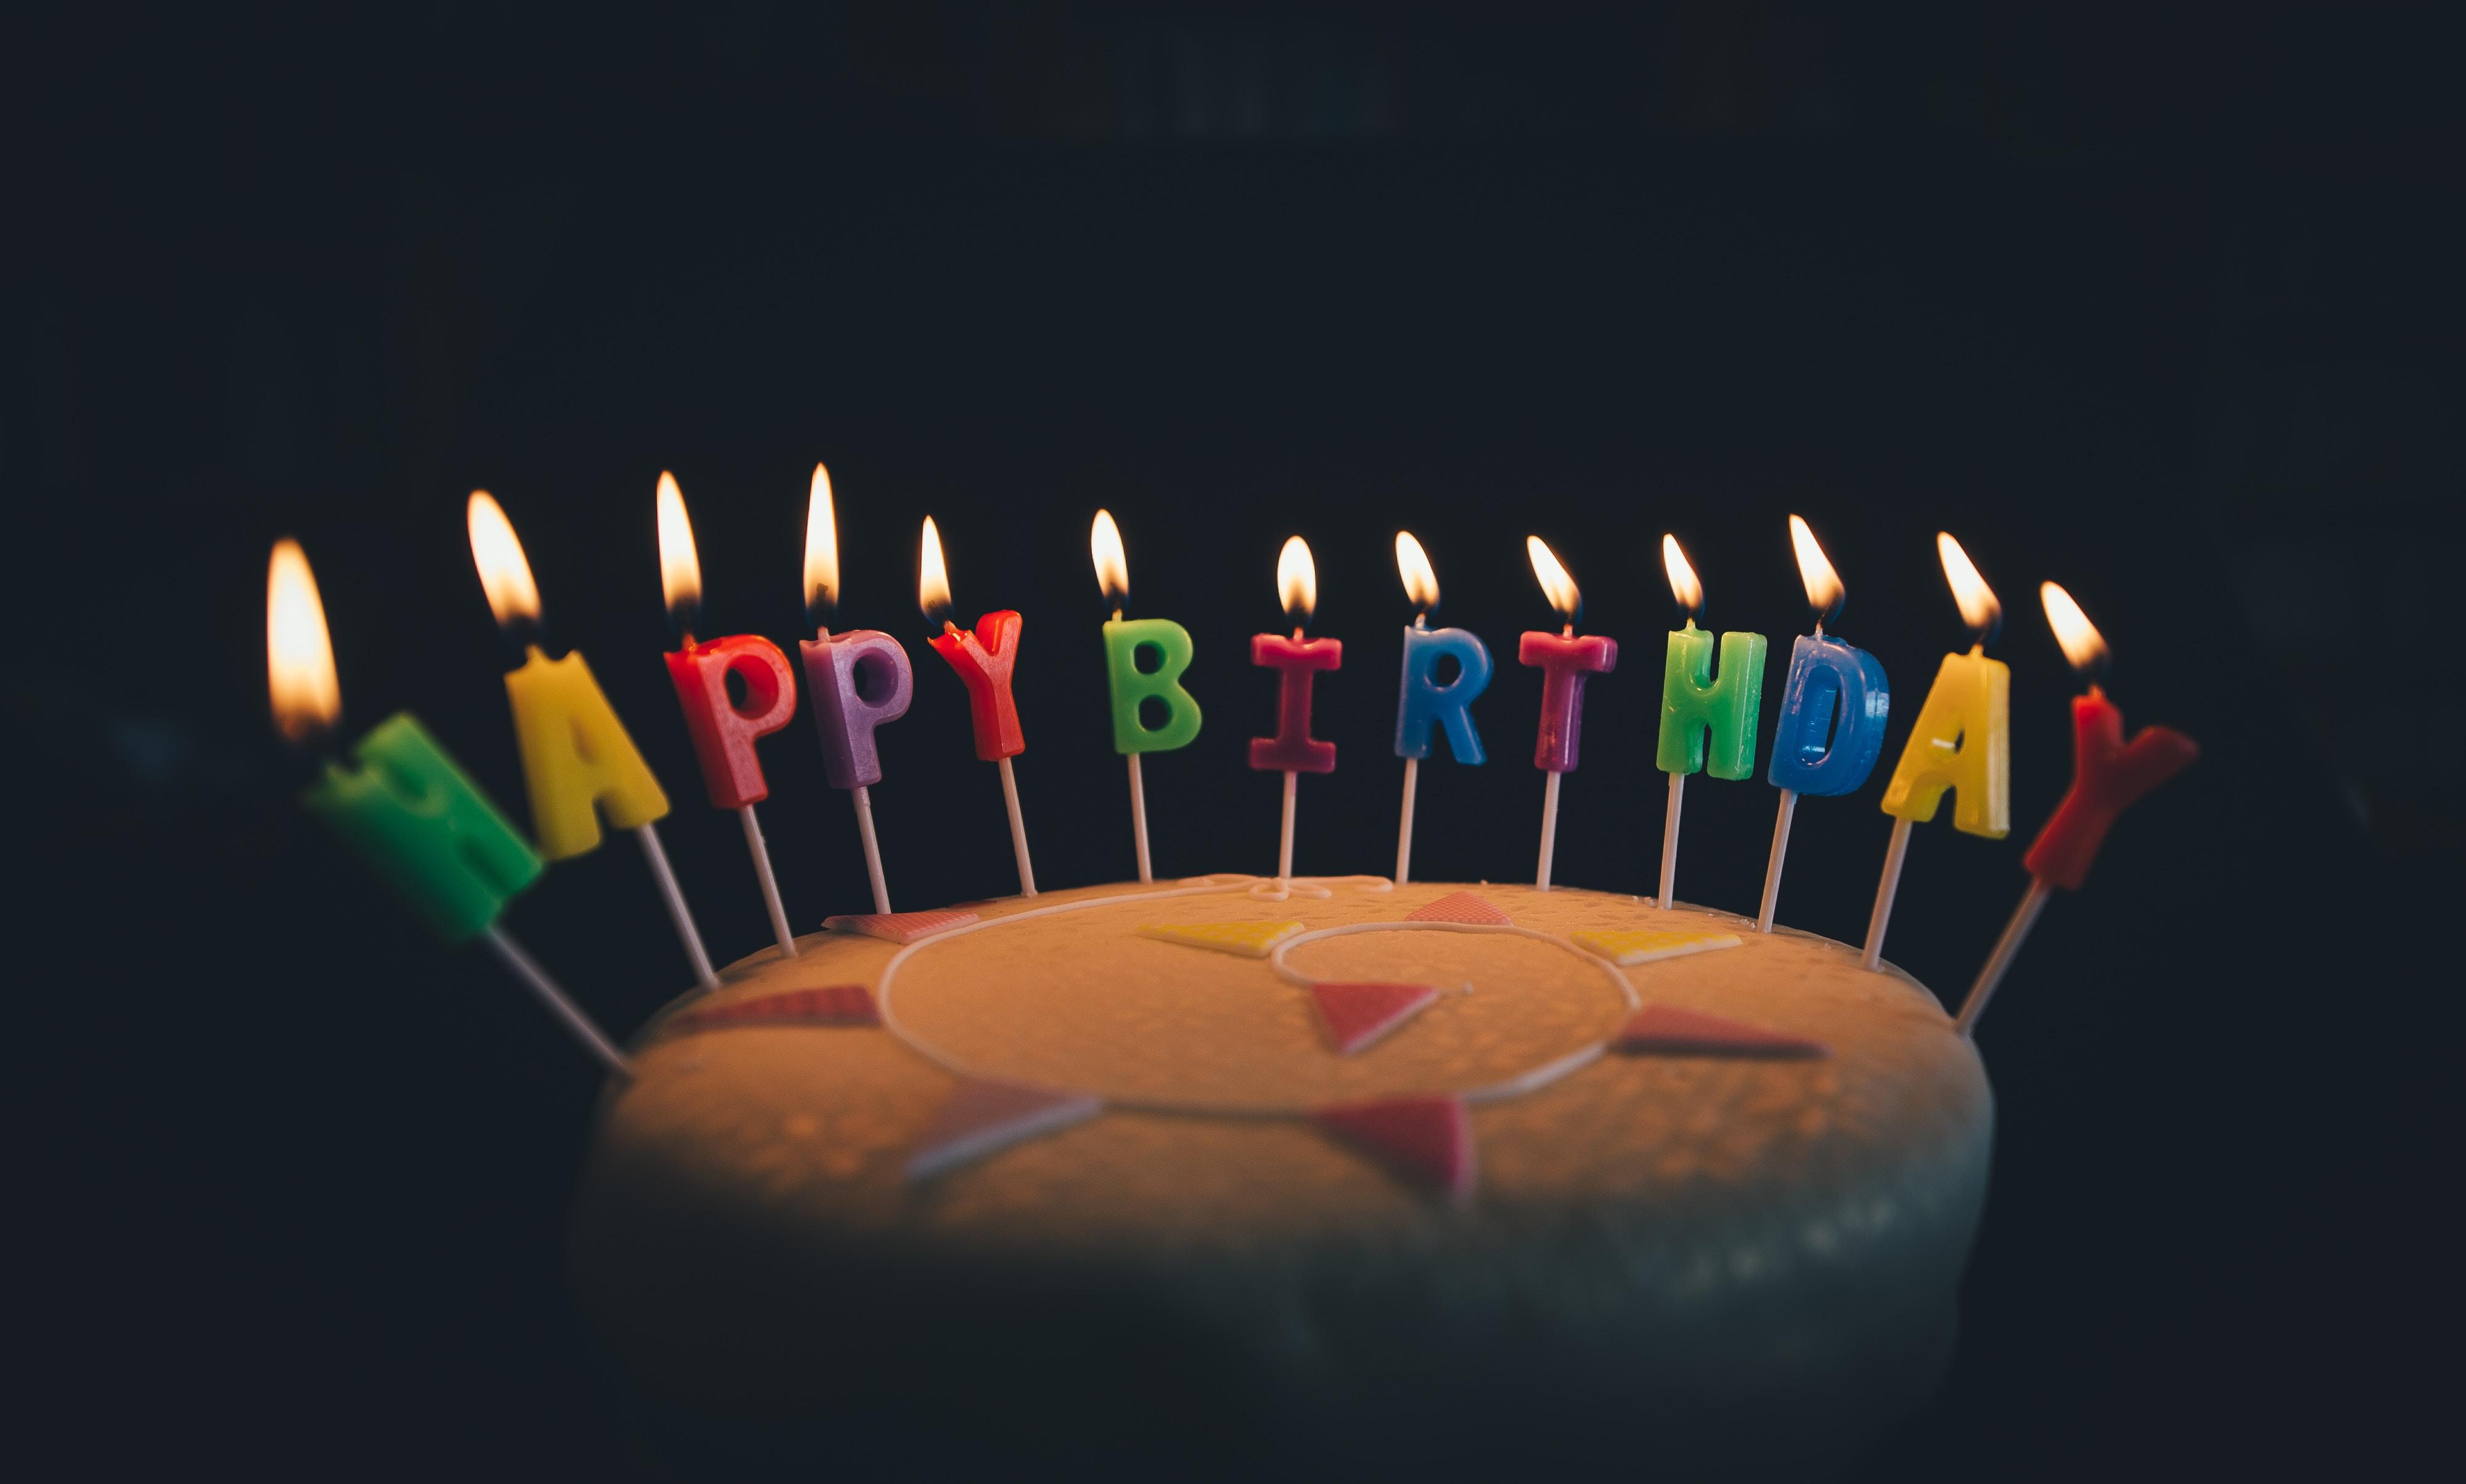 round fondant cake with happy birthday candle